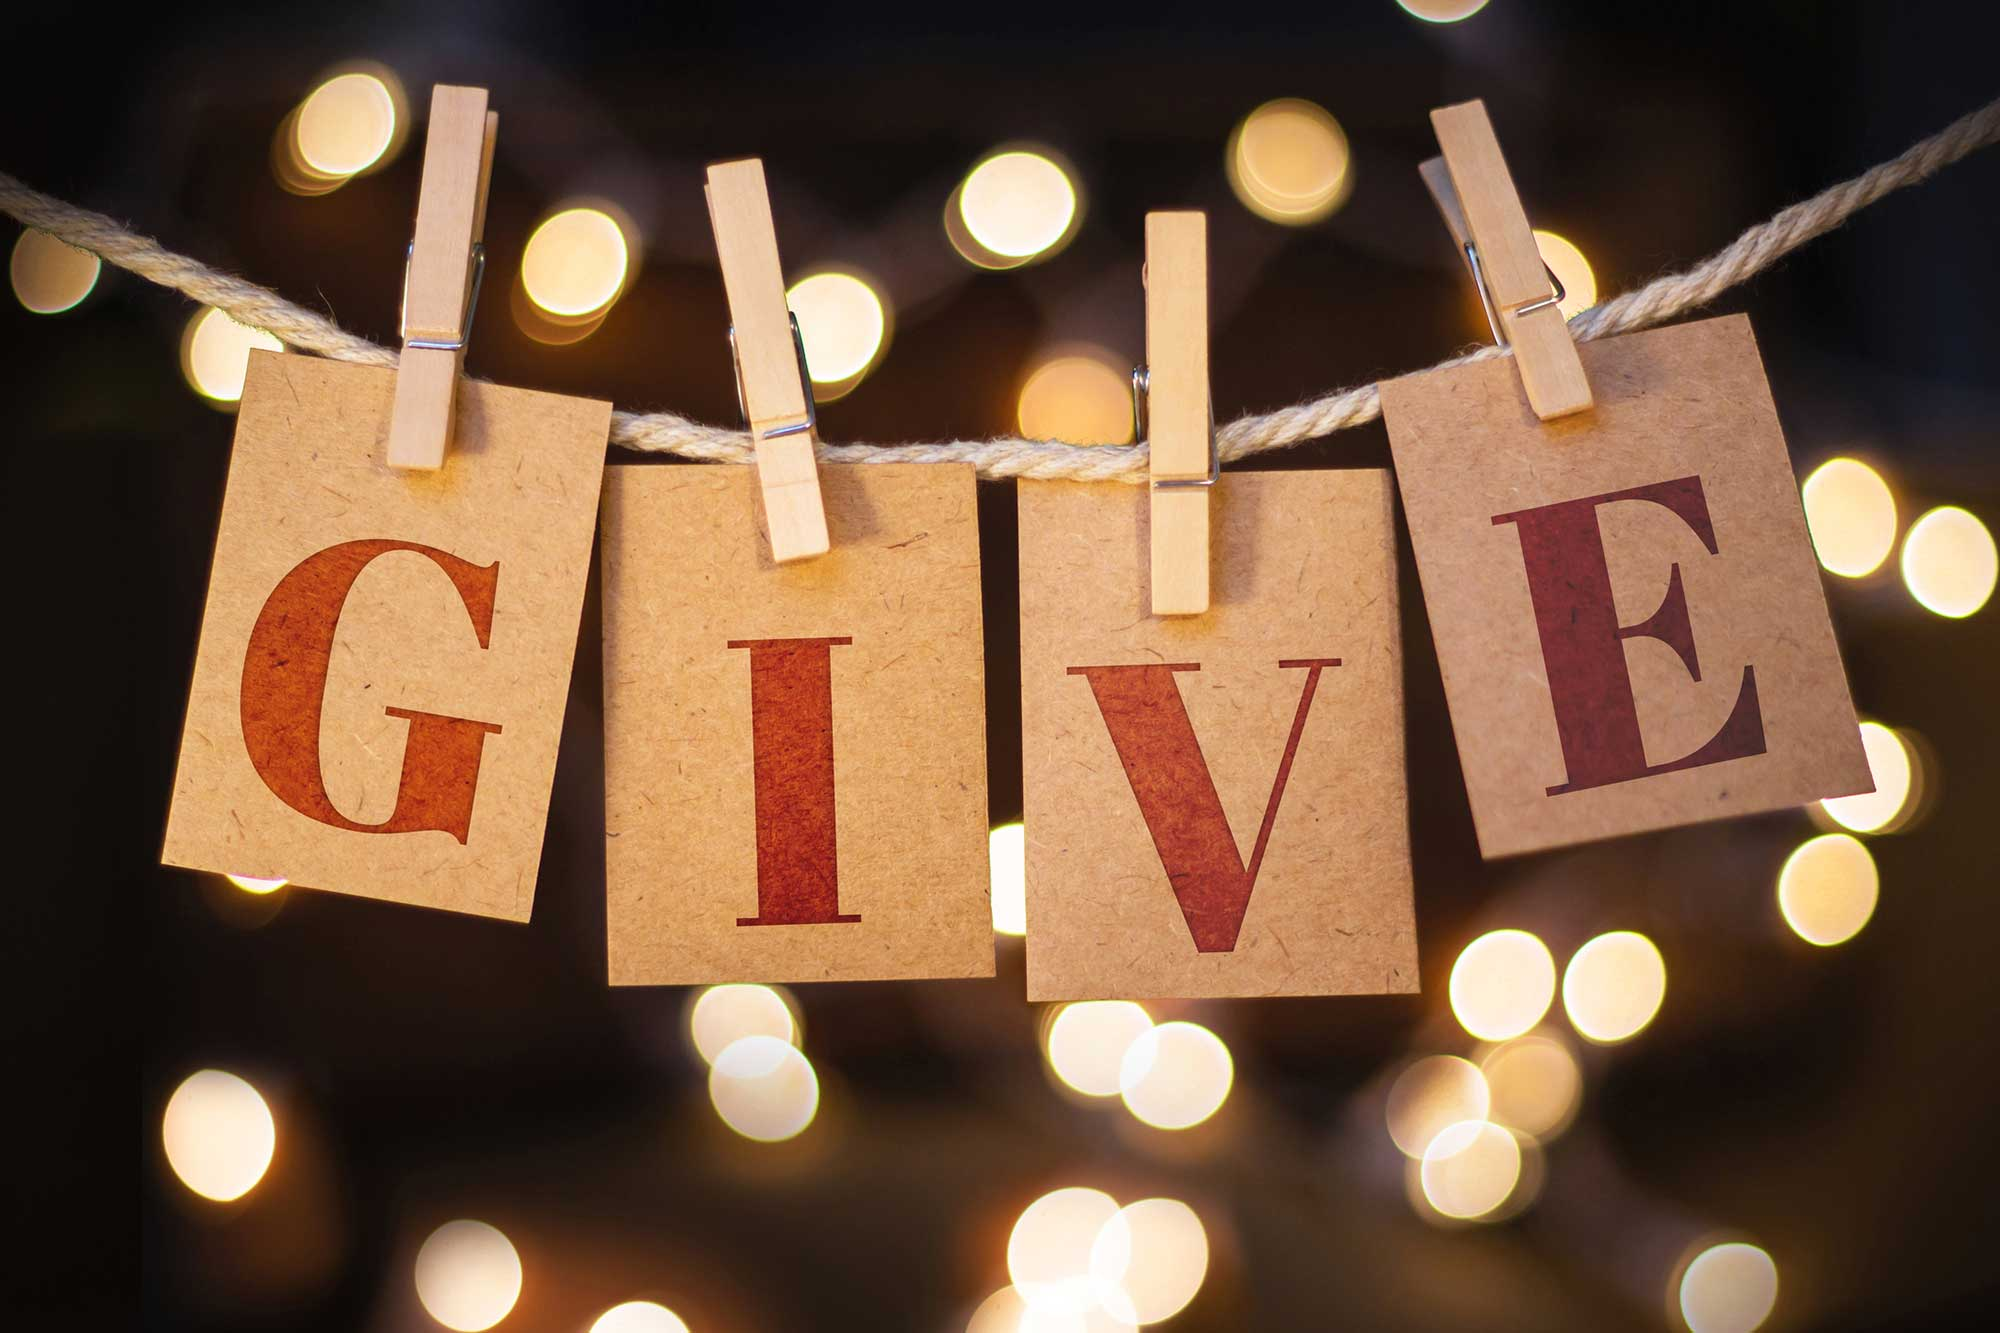 #GivingTuesday is November 28th